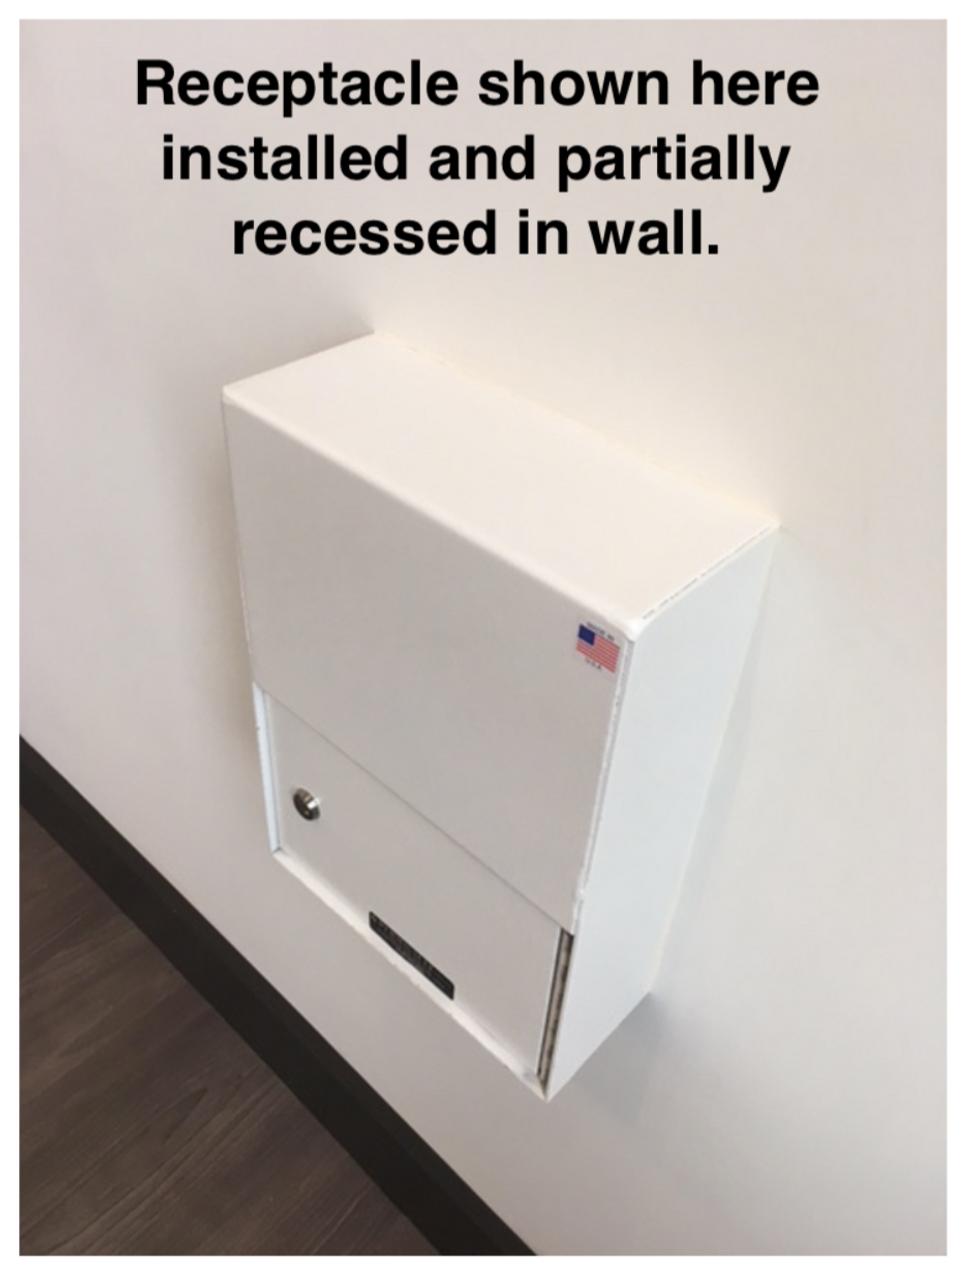 Custom High Security Through The Wall Deposit Drop Box